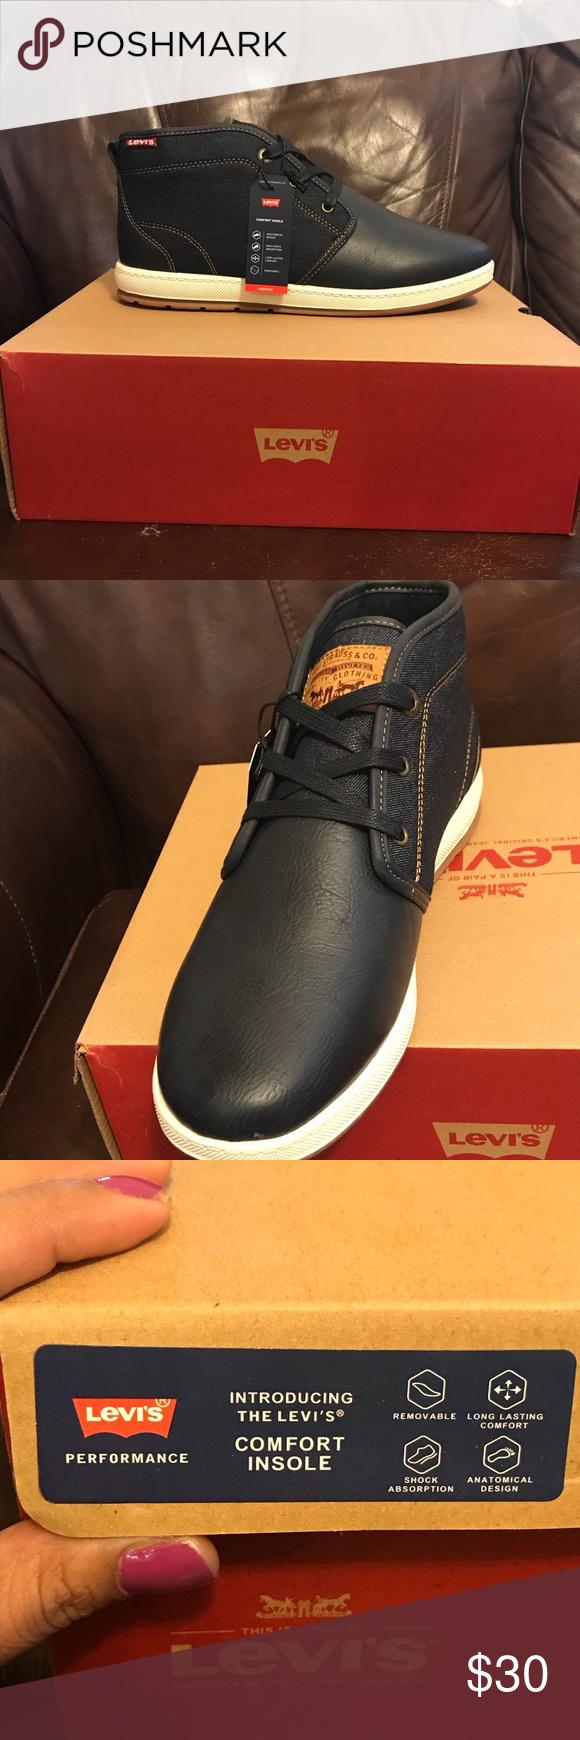 Ace Milestone Denim Levi's shoe. MENS